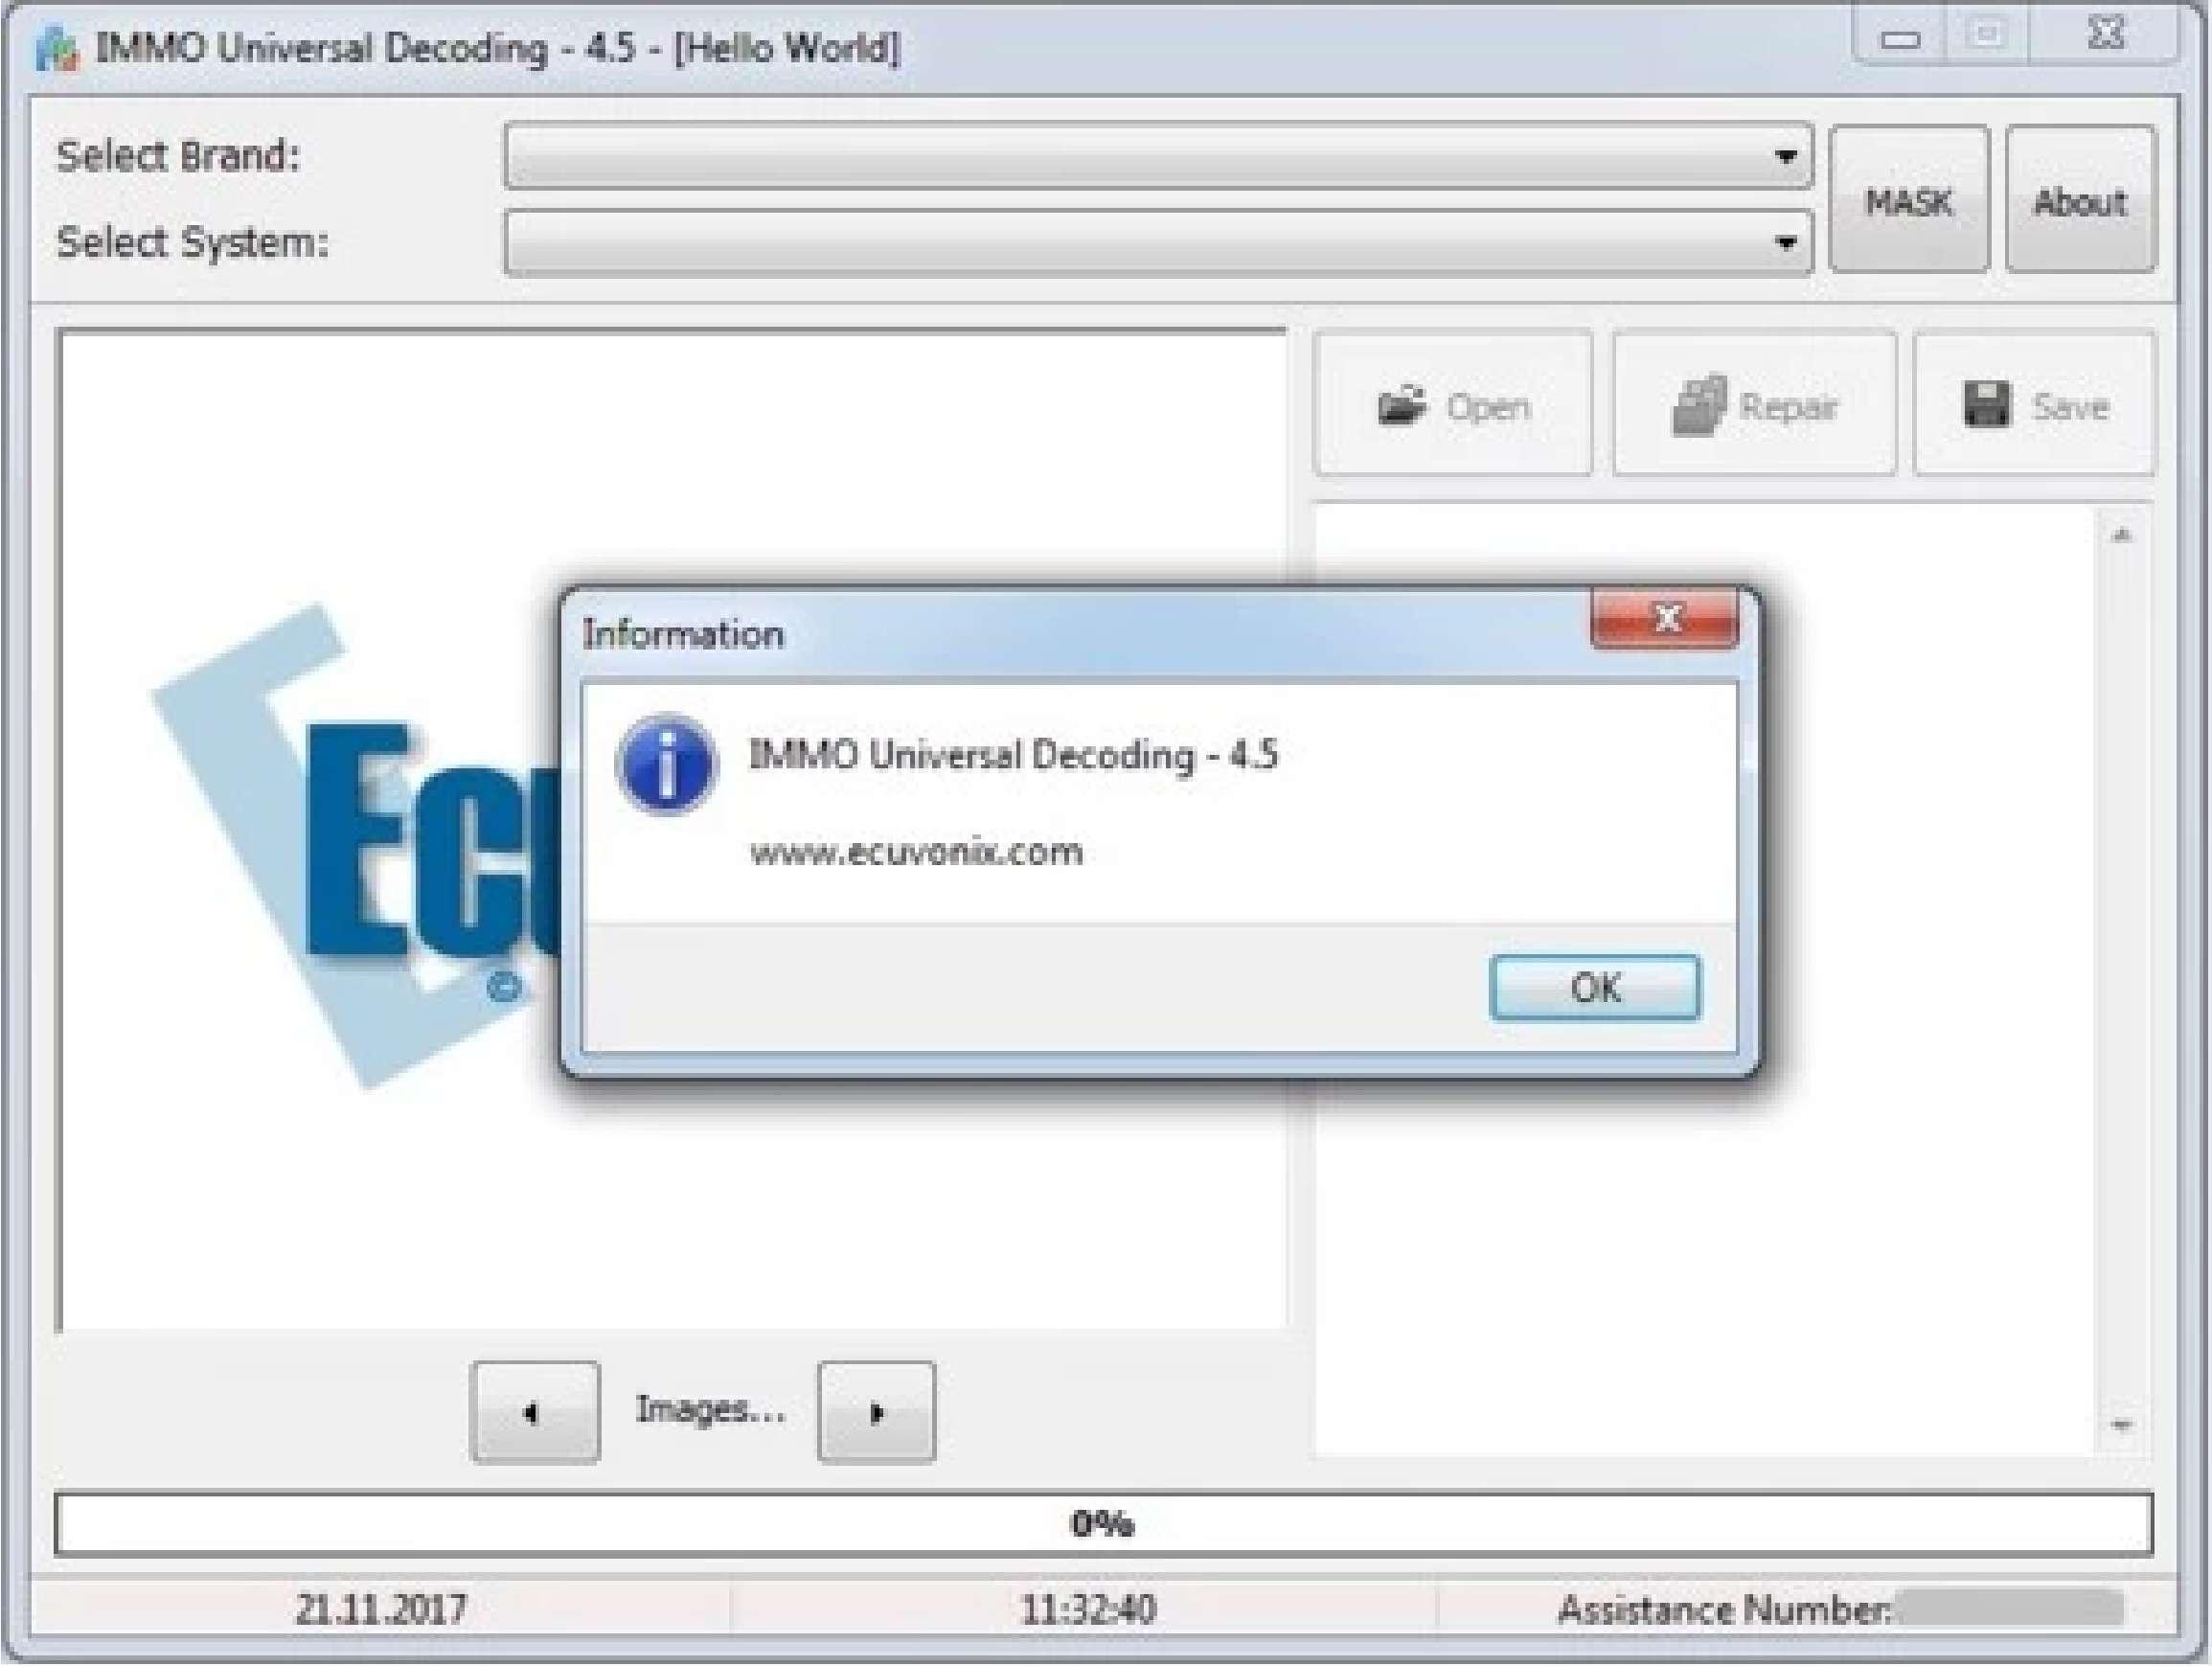 IMMO Universal Decoding Ecuvonix 4.5 ss-01